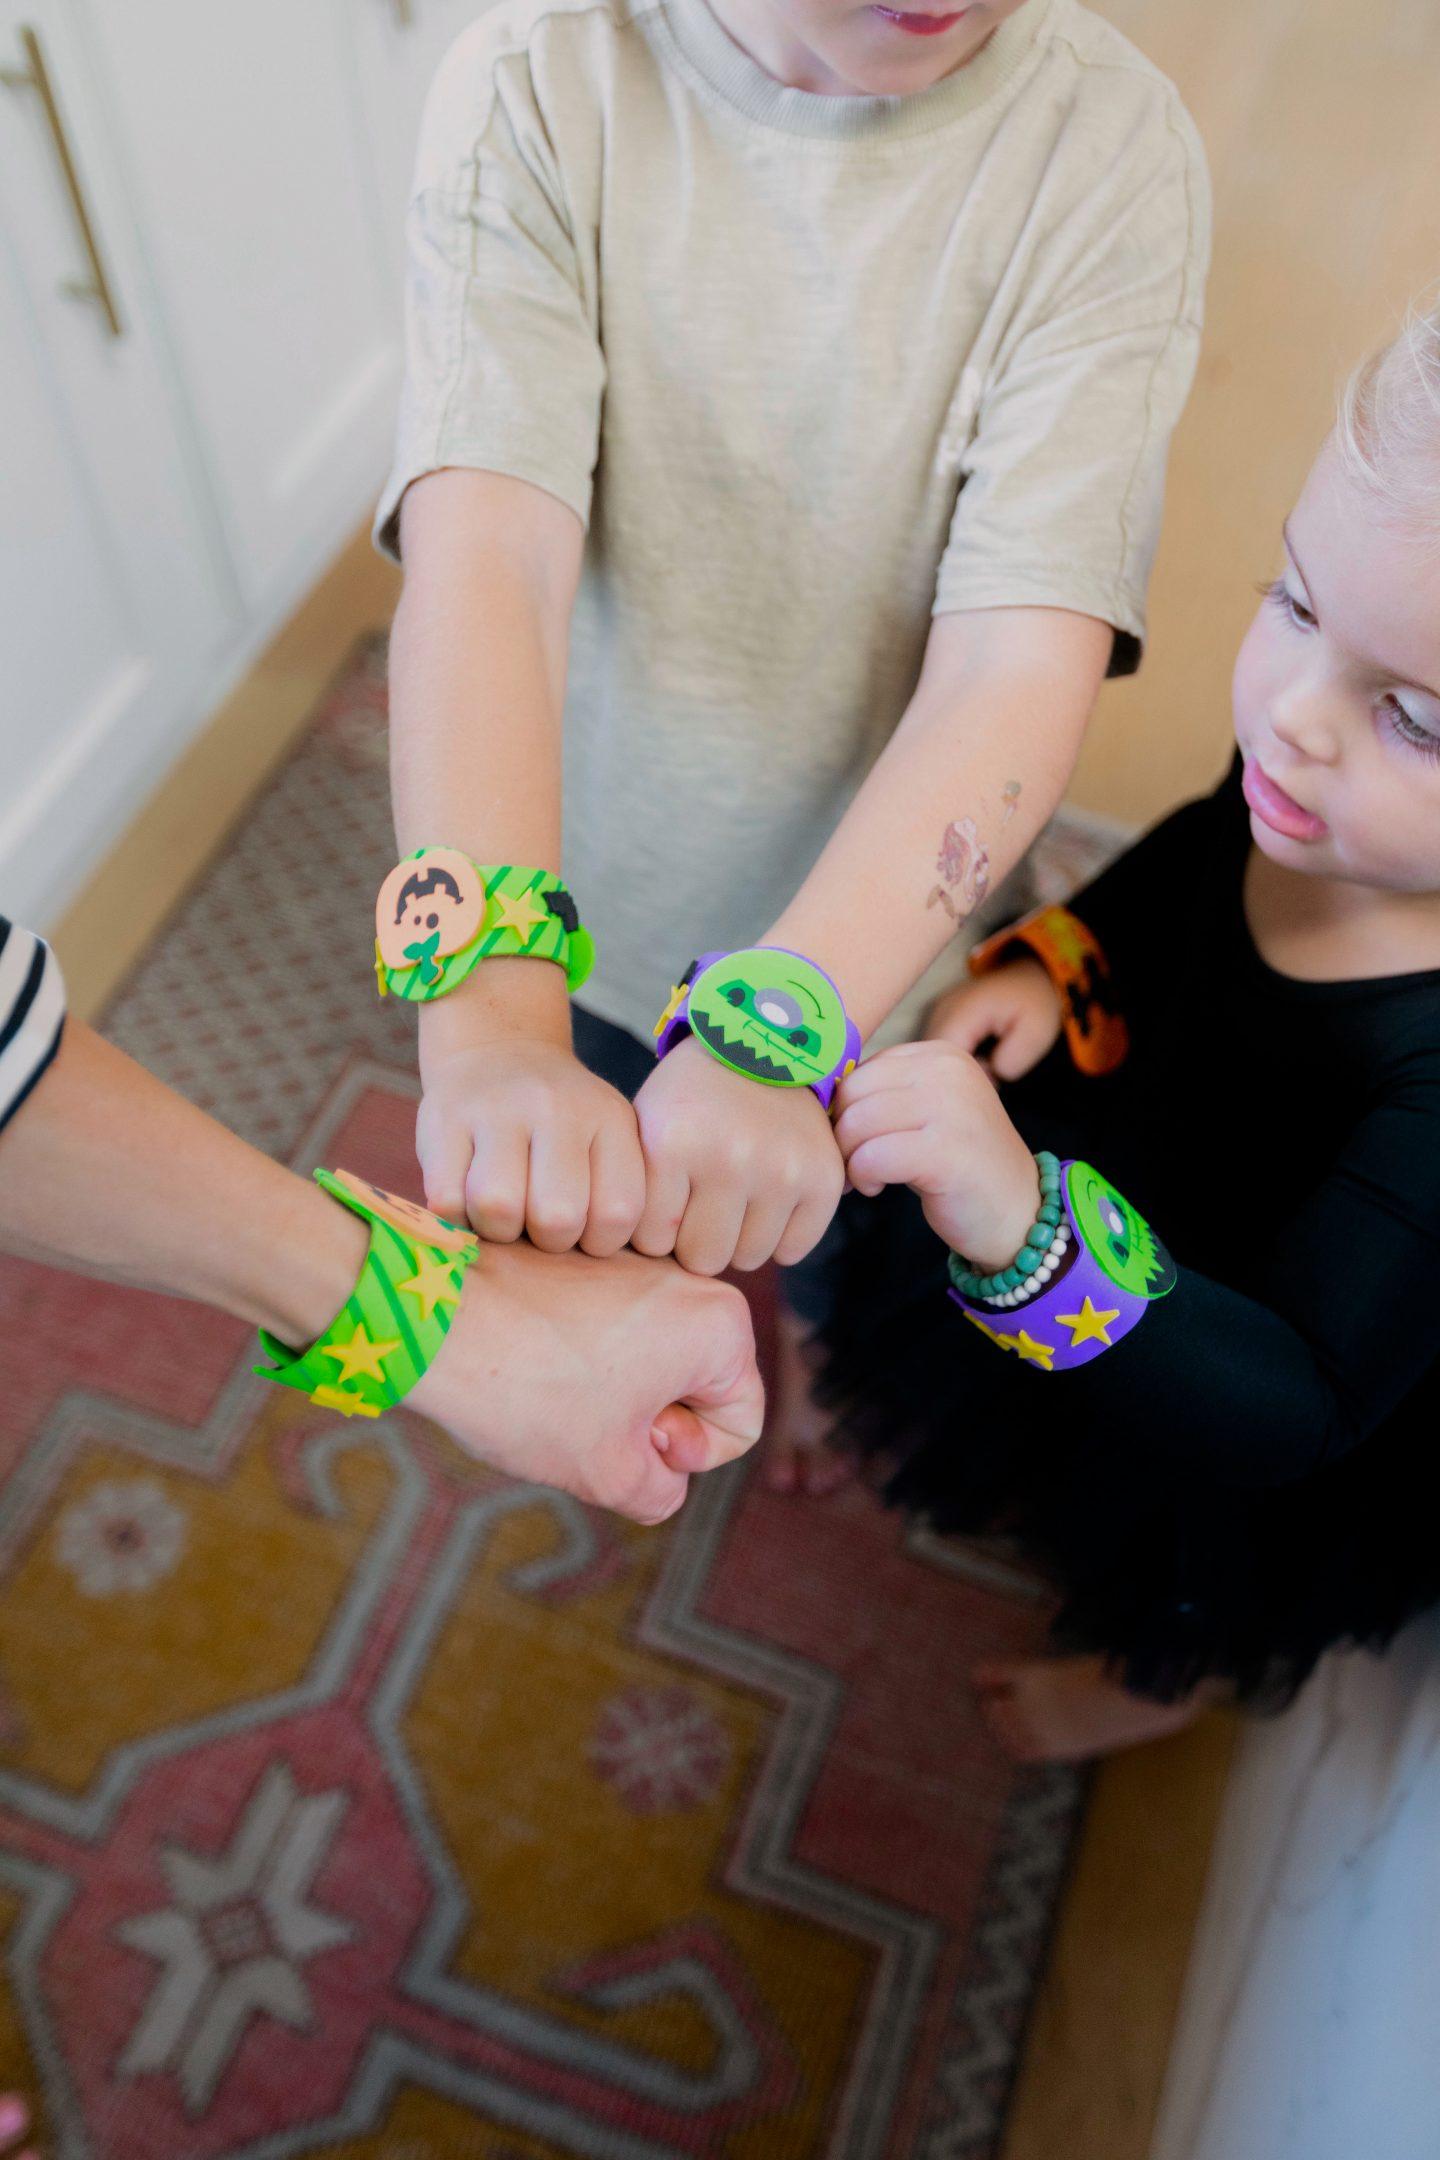 children wearing wristbands